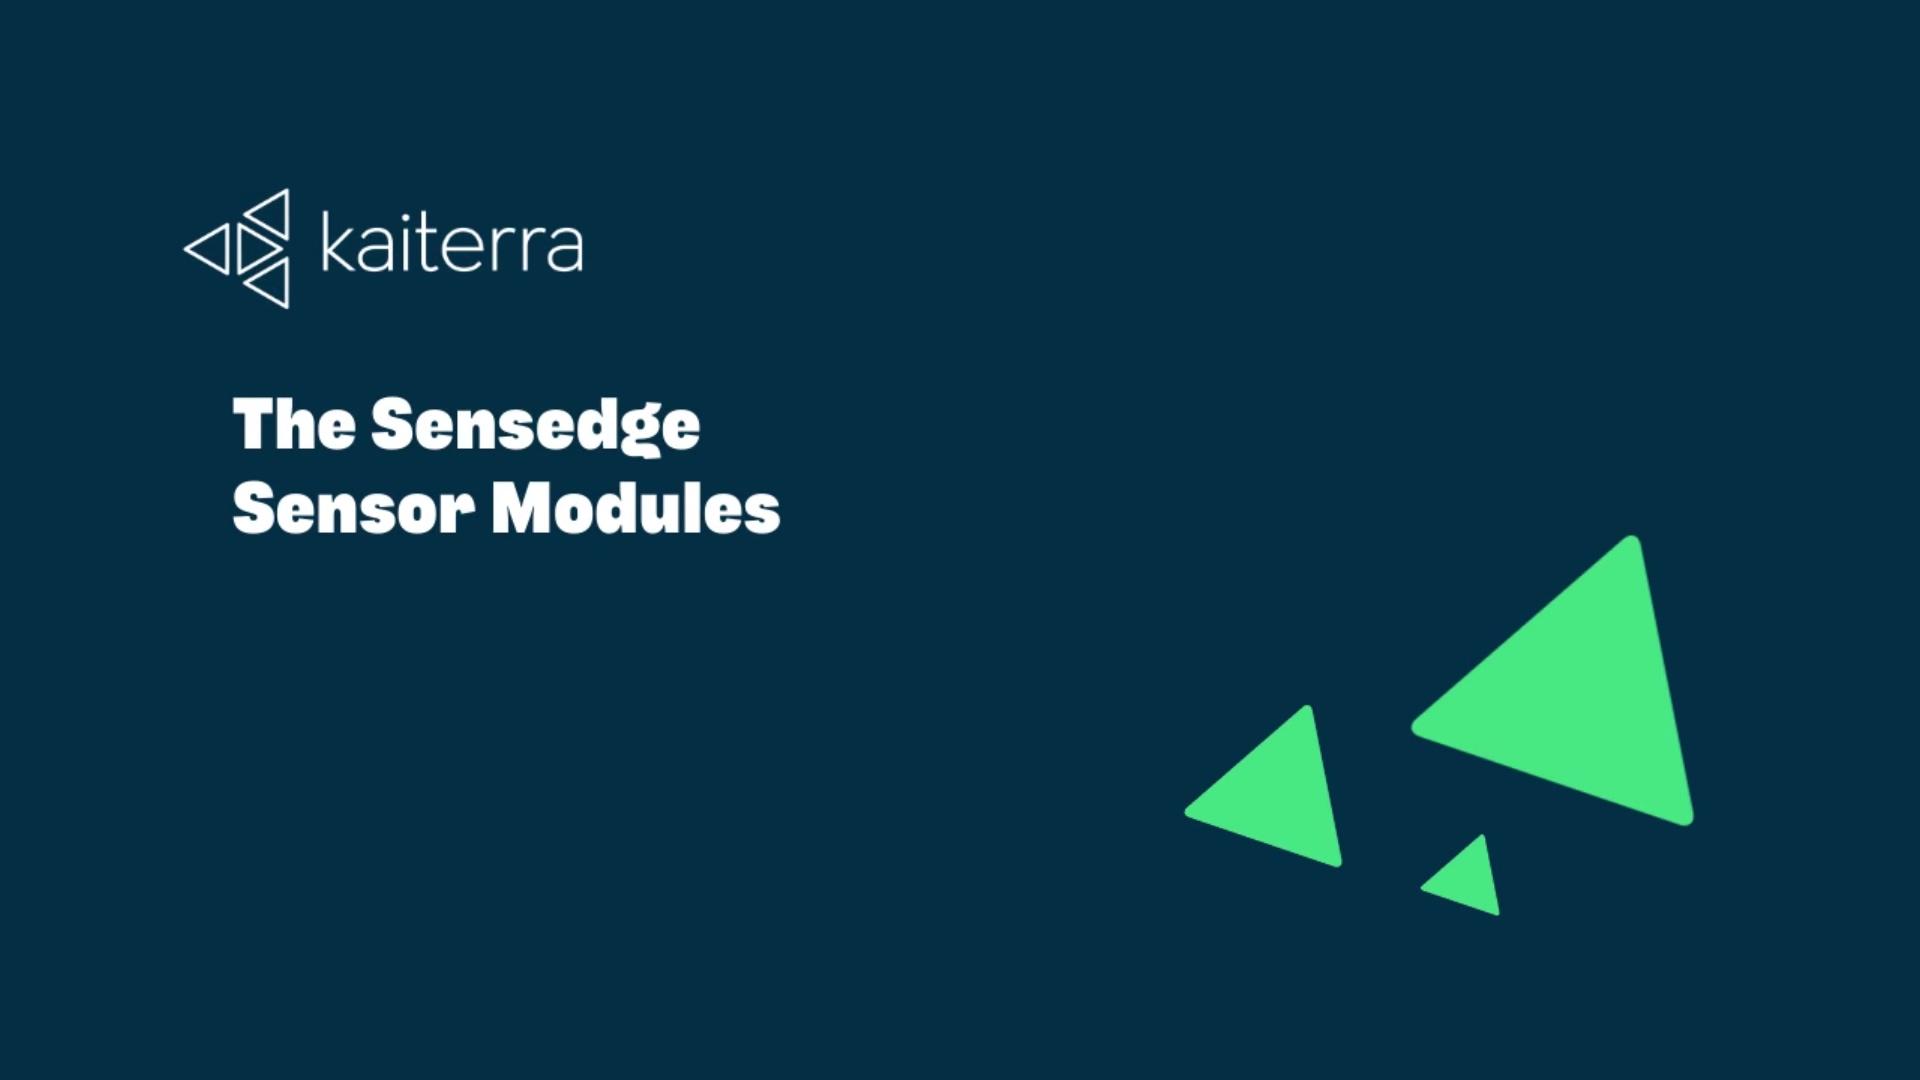 The Sensedge Sensor Modules